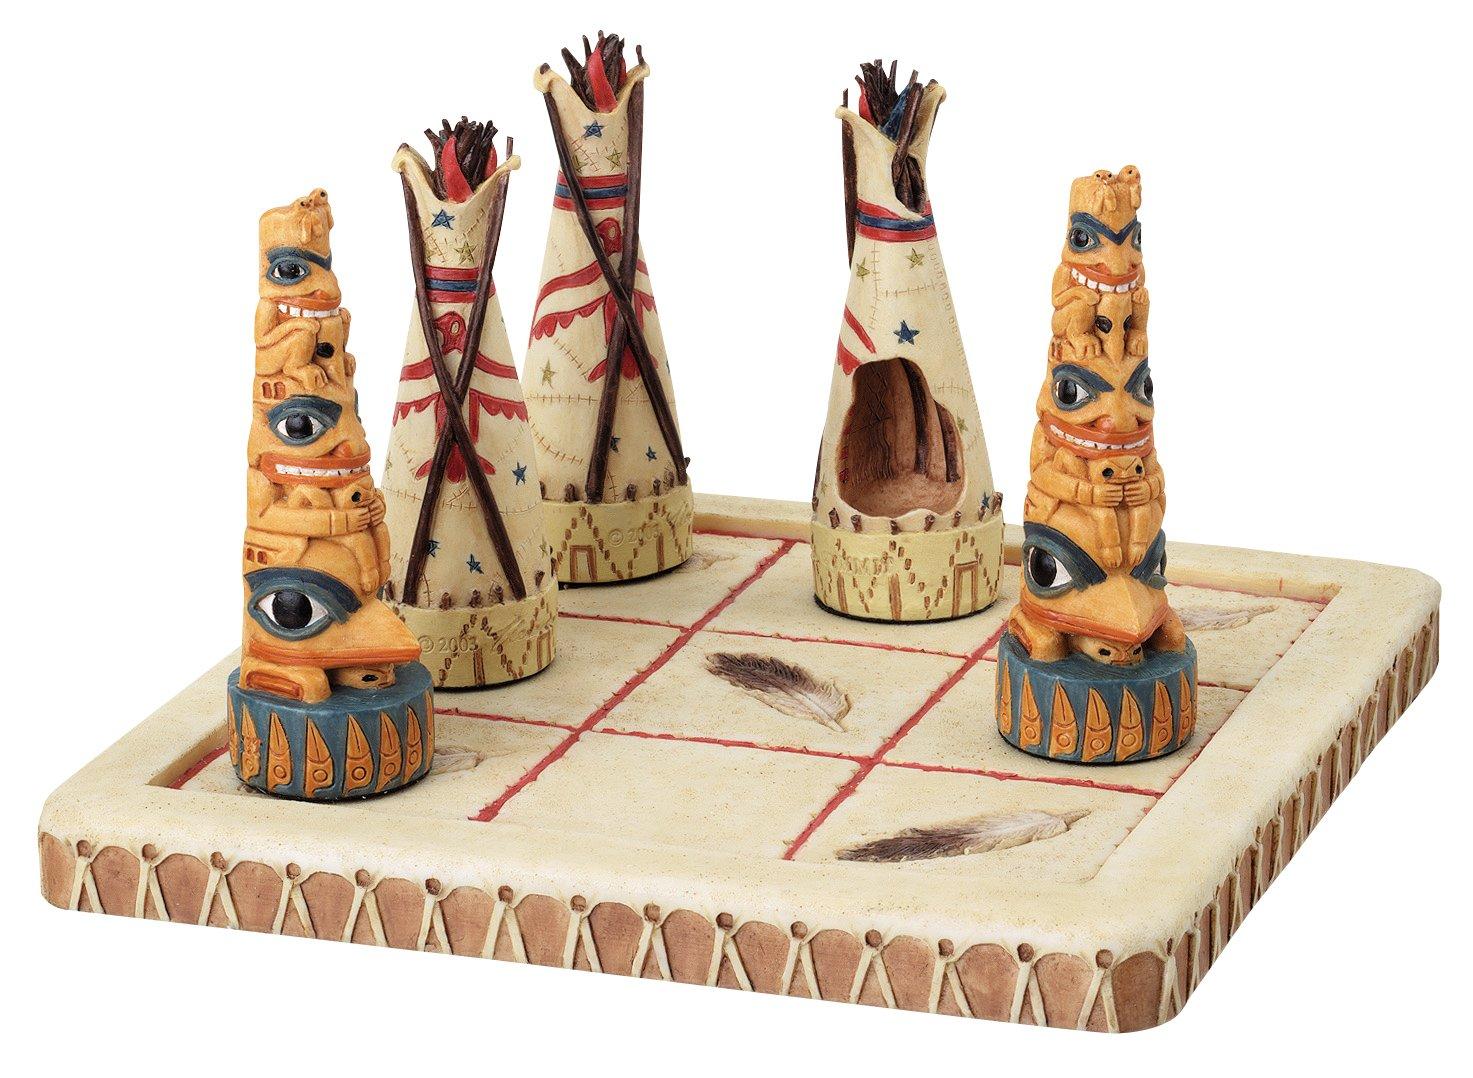 YTC Summit Tic Tac Toe nativo tribus figura decorativa